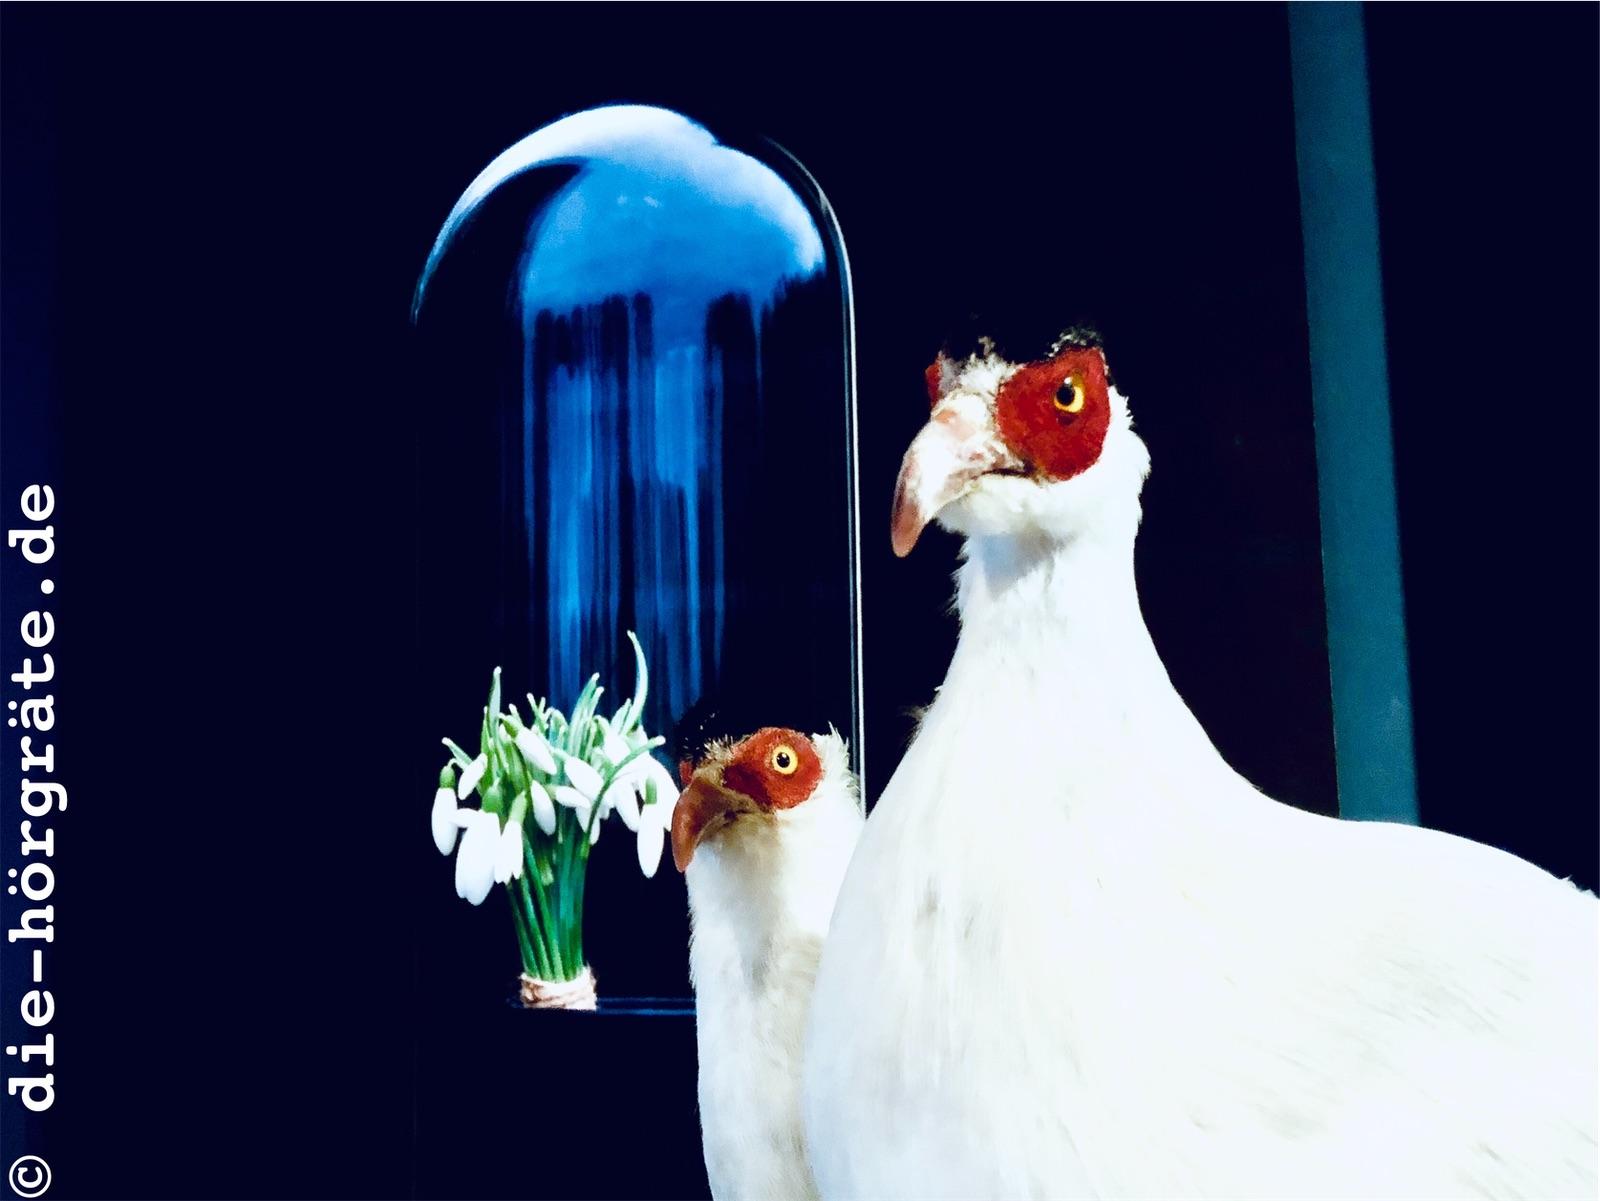 zwei weiße Vögel